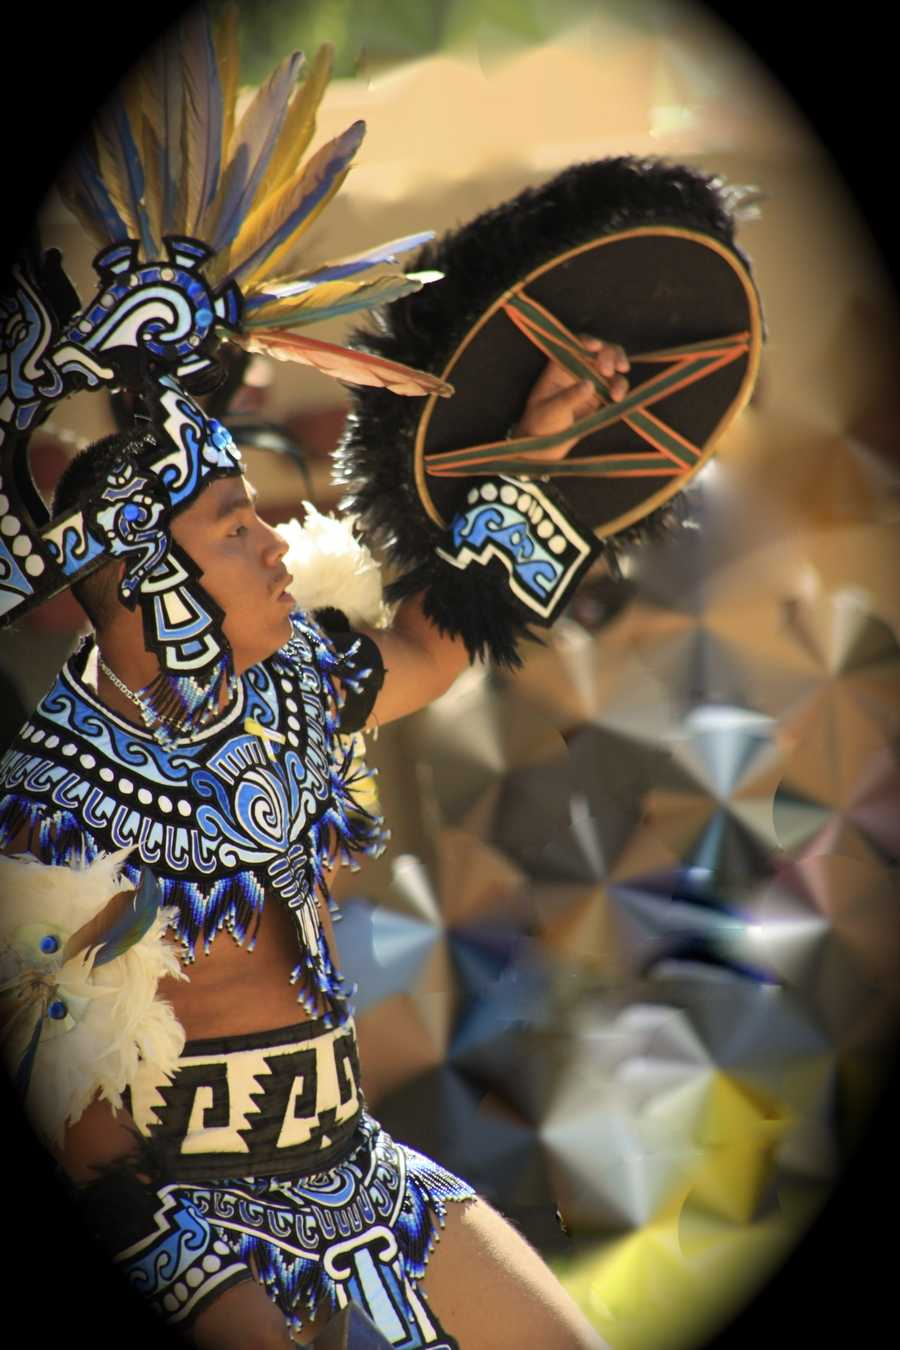 Saturday, September 21: 3:00 p.m.: Tlanextli Tlacopan Aztec Fire Dancers (Aztec Fire Dancers) Indian Village